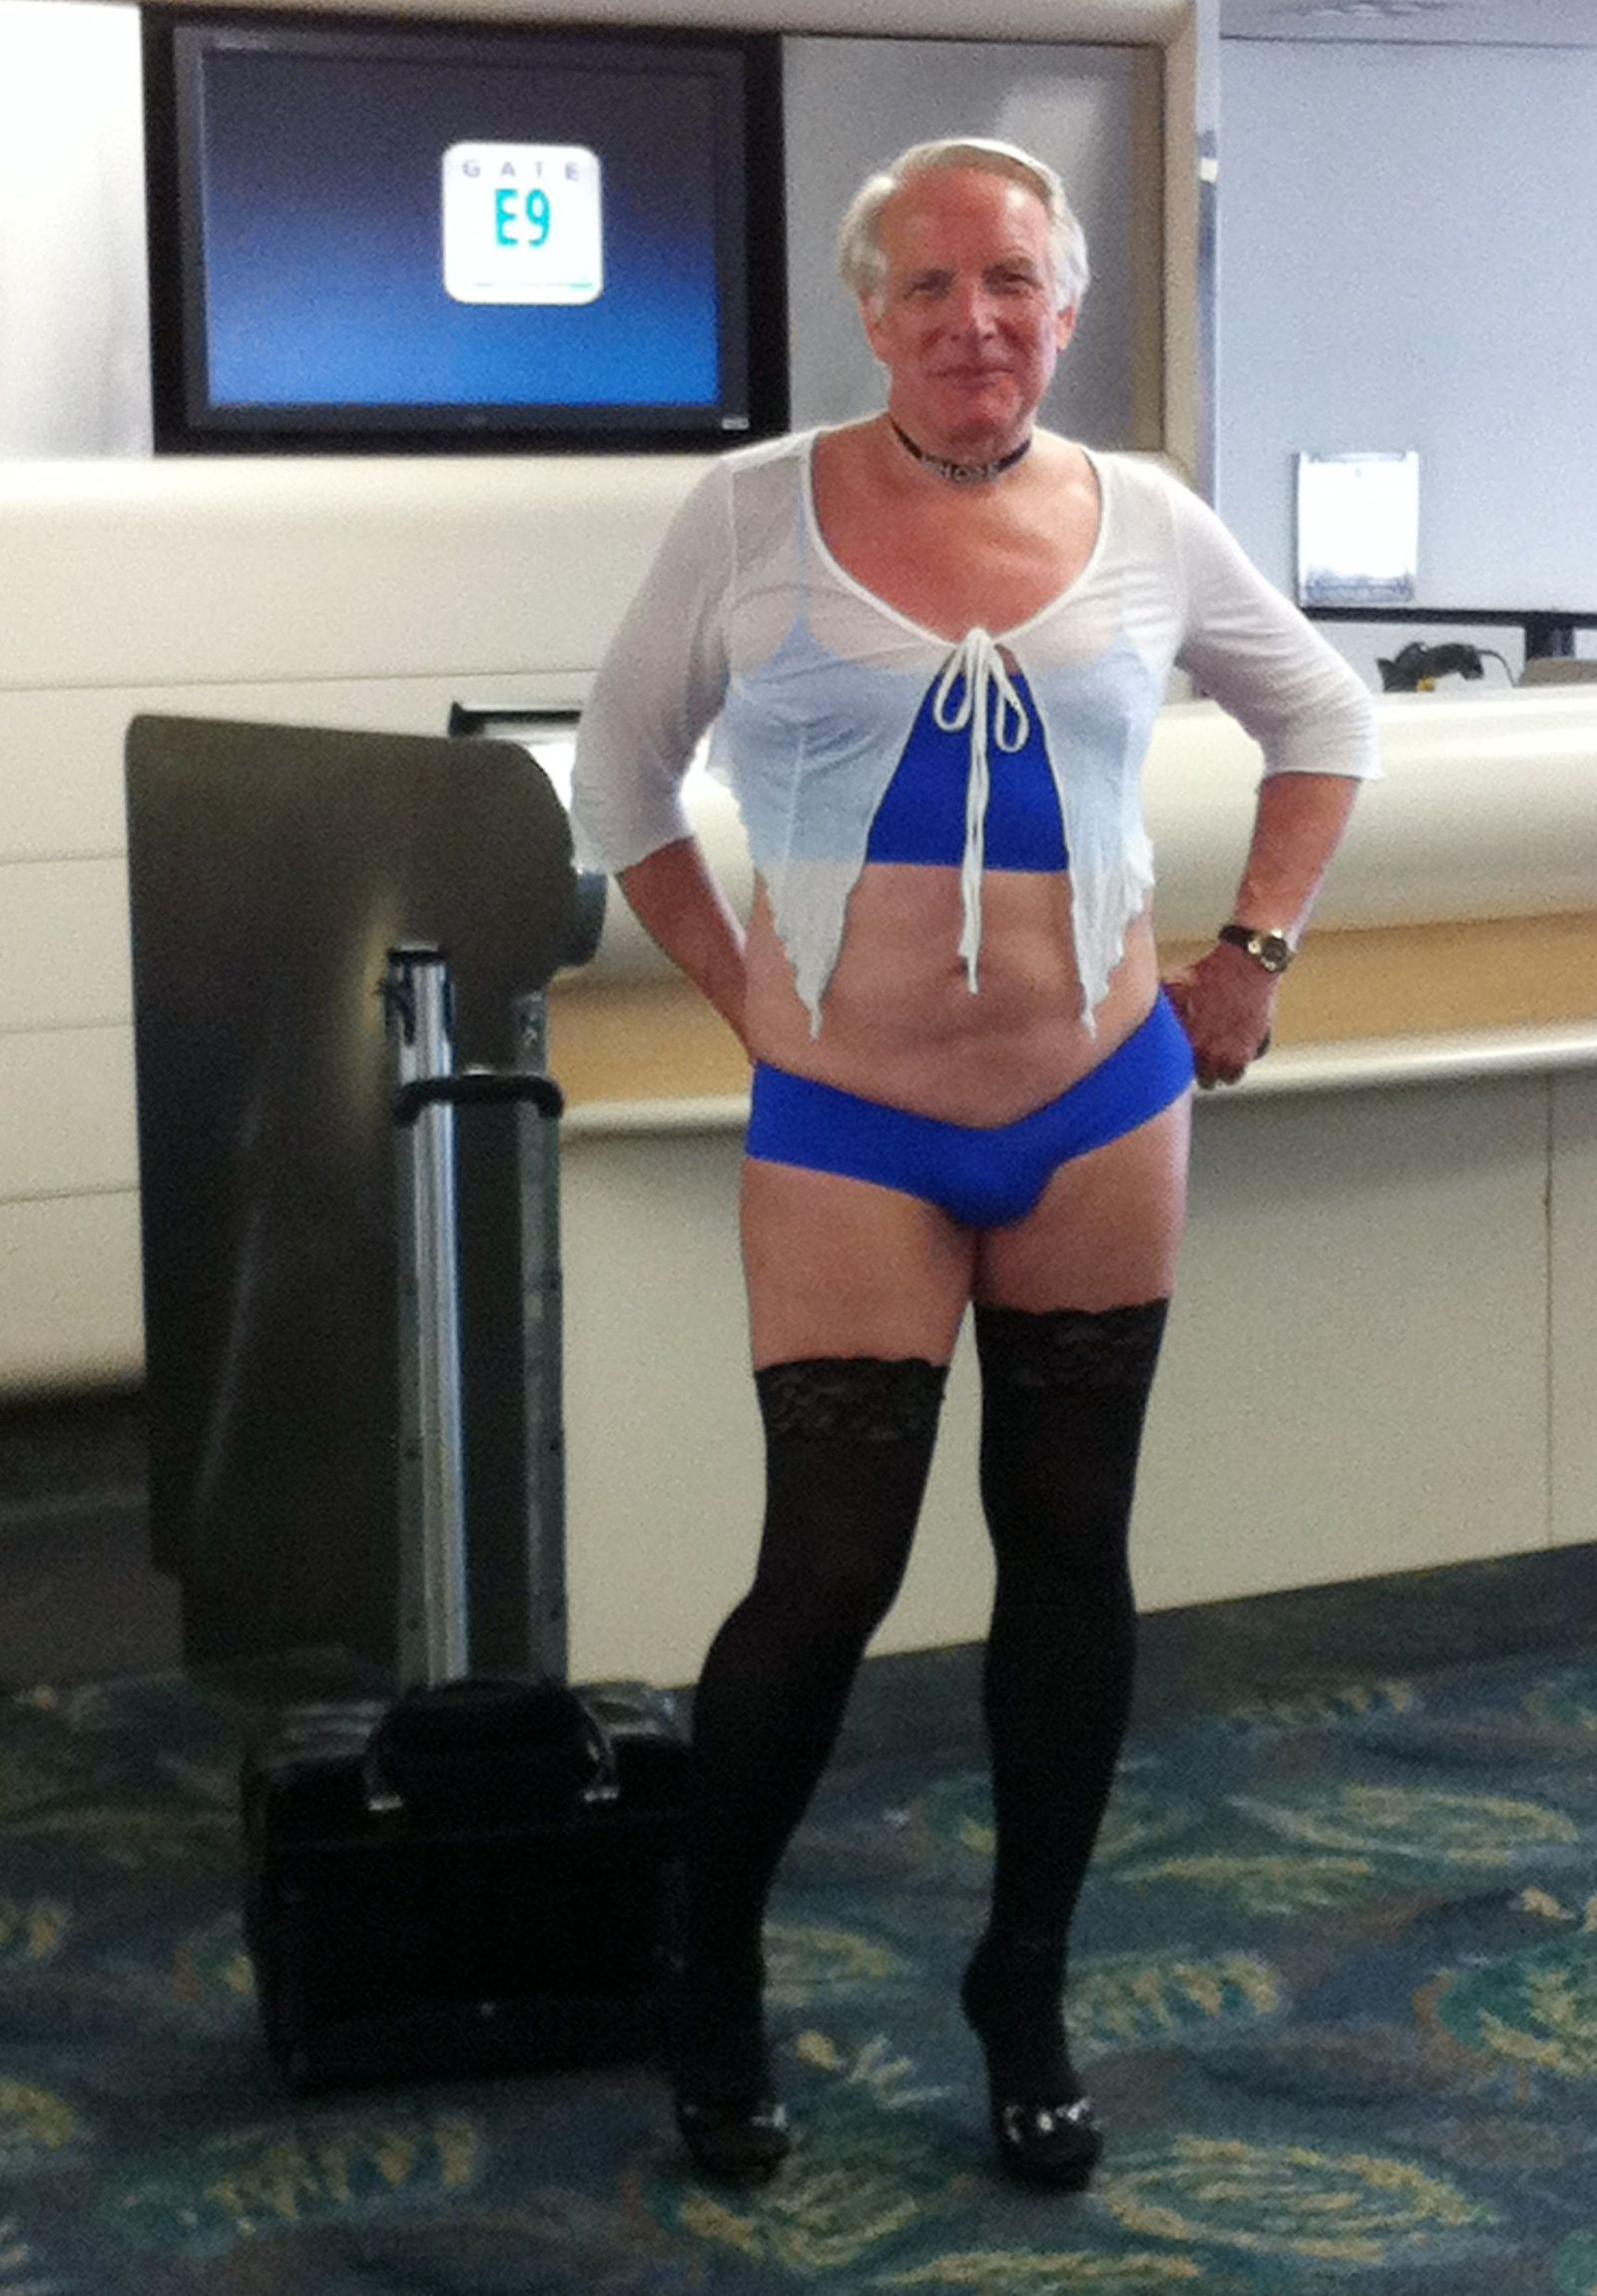 US Airways/ Mann in Frauenkleidung